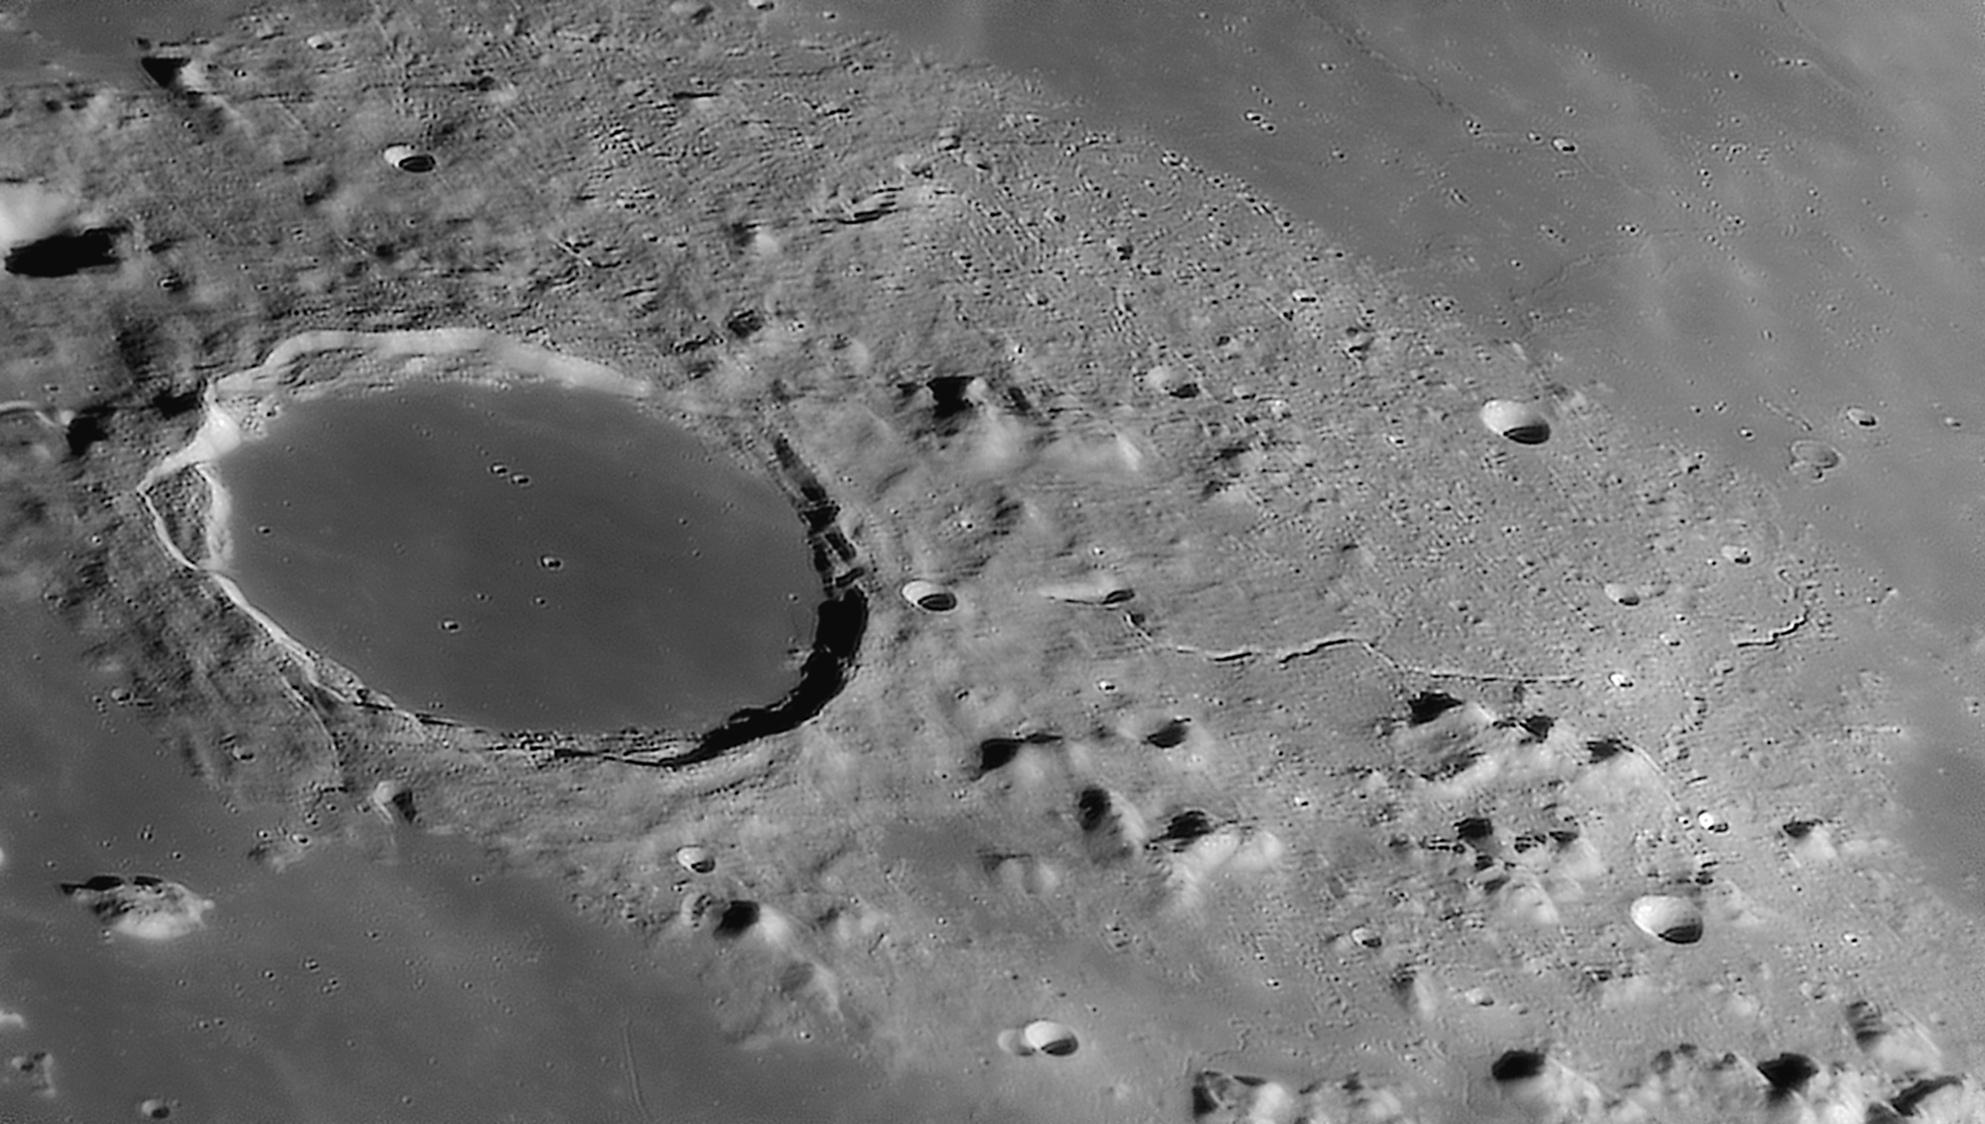 large.moon_03_04_2020_PLATON.jpg.9c3ad1d18a0635ac4d3288c01c4853e7.jpg